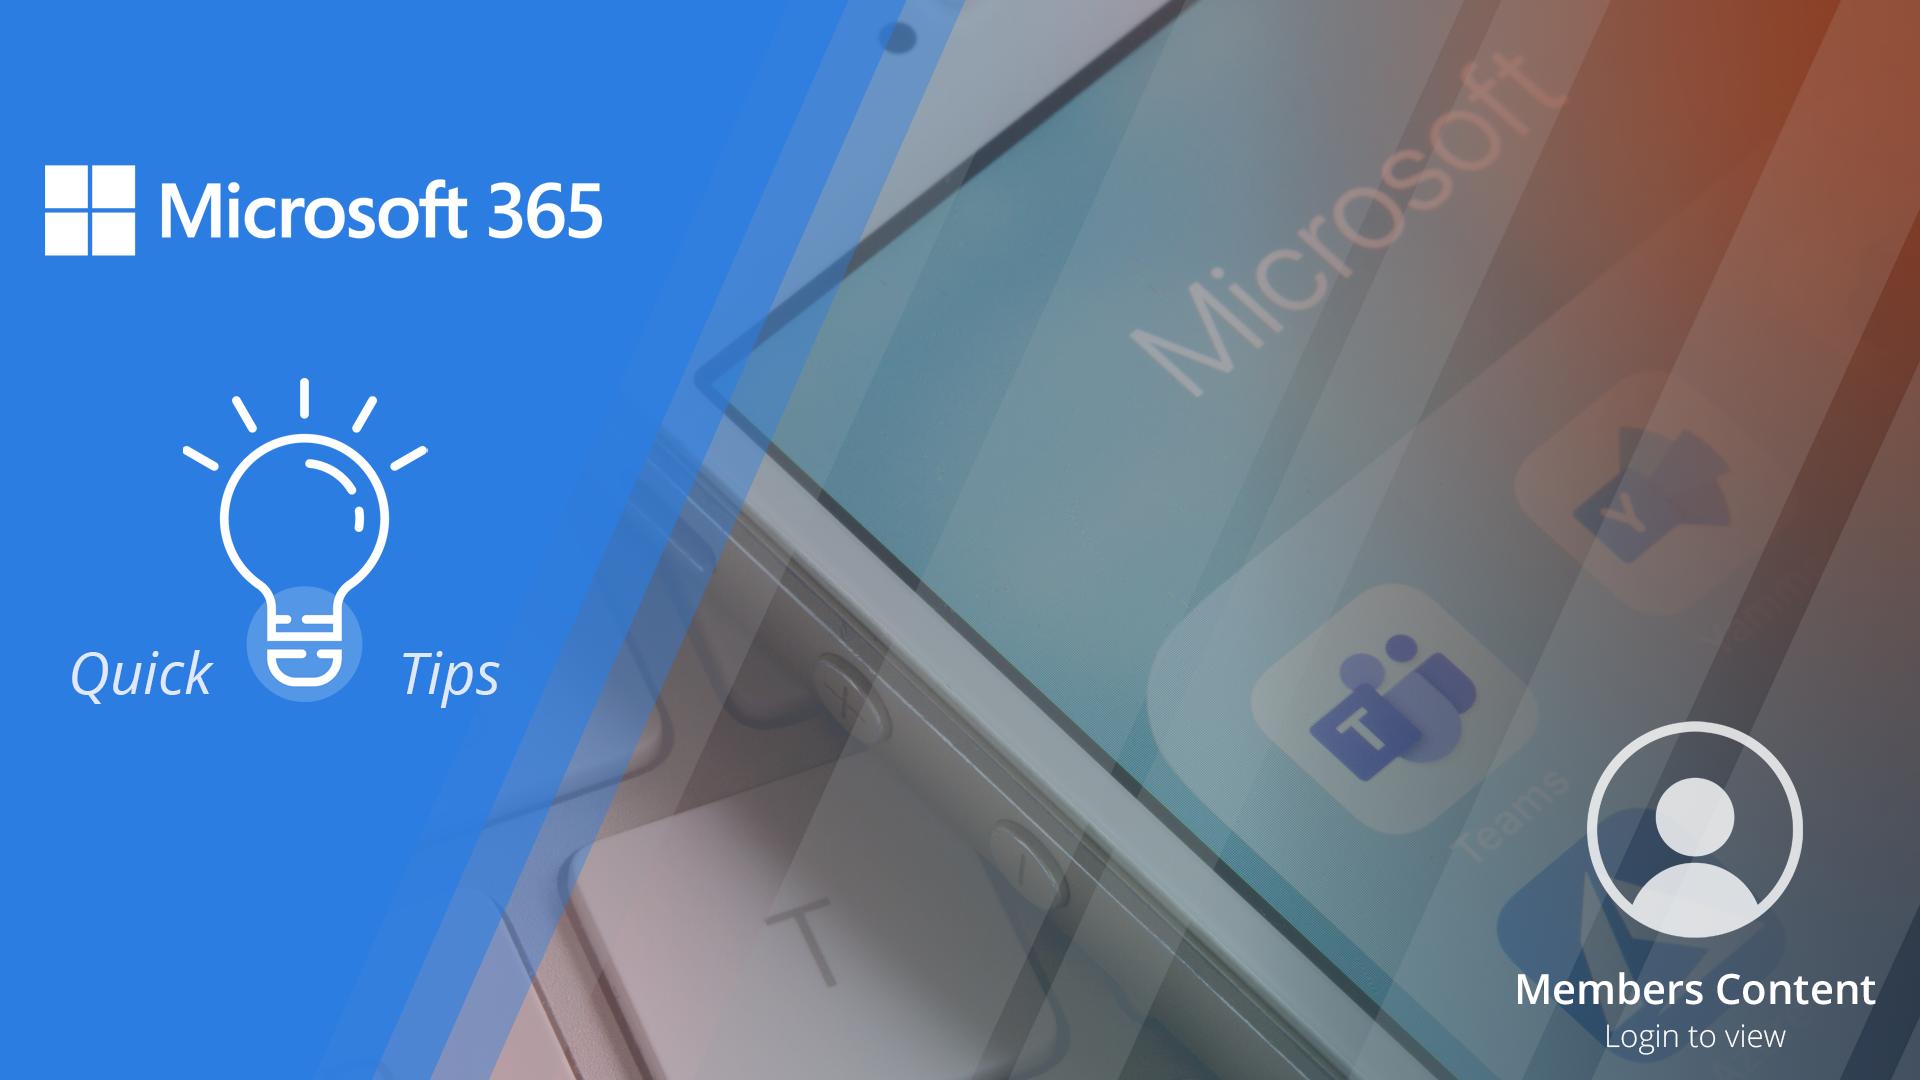 Microsoft 365 Quick Tips